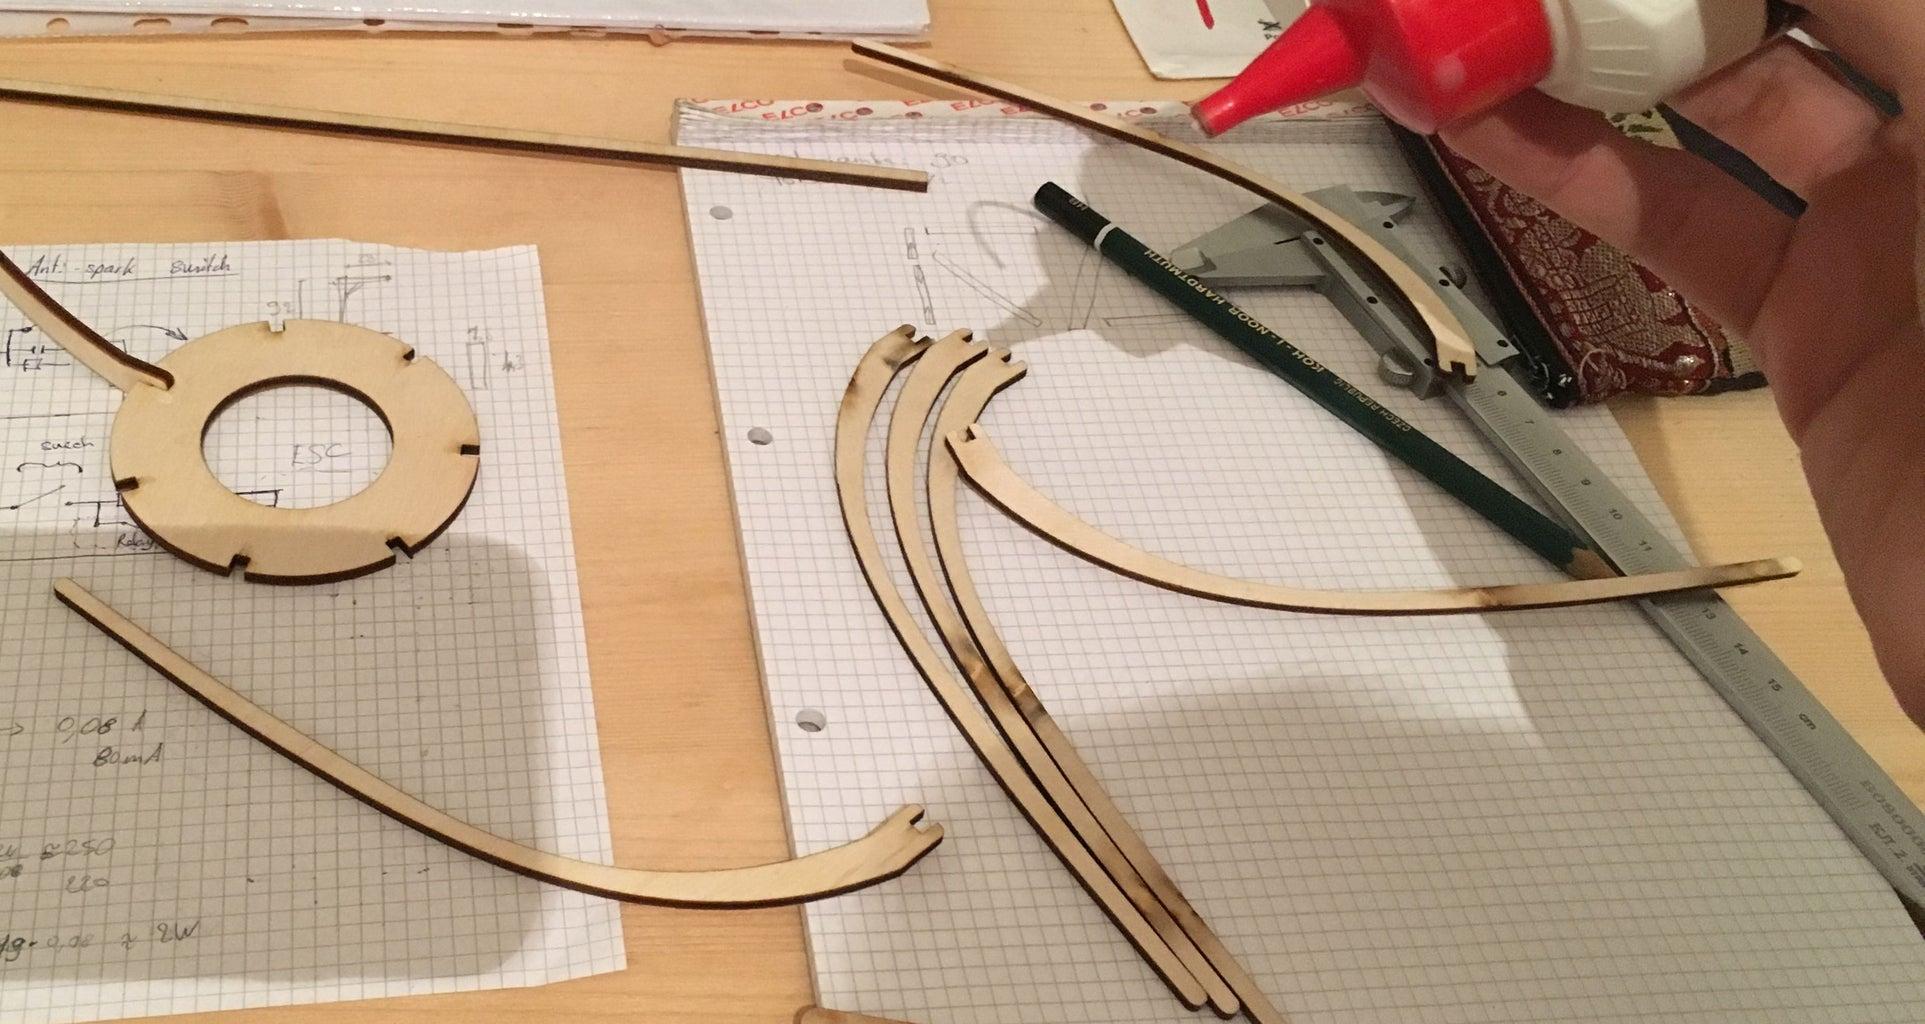 Cut and Glue the Frame